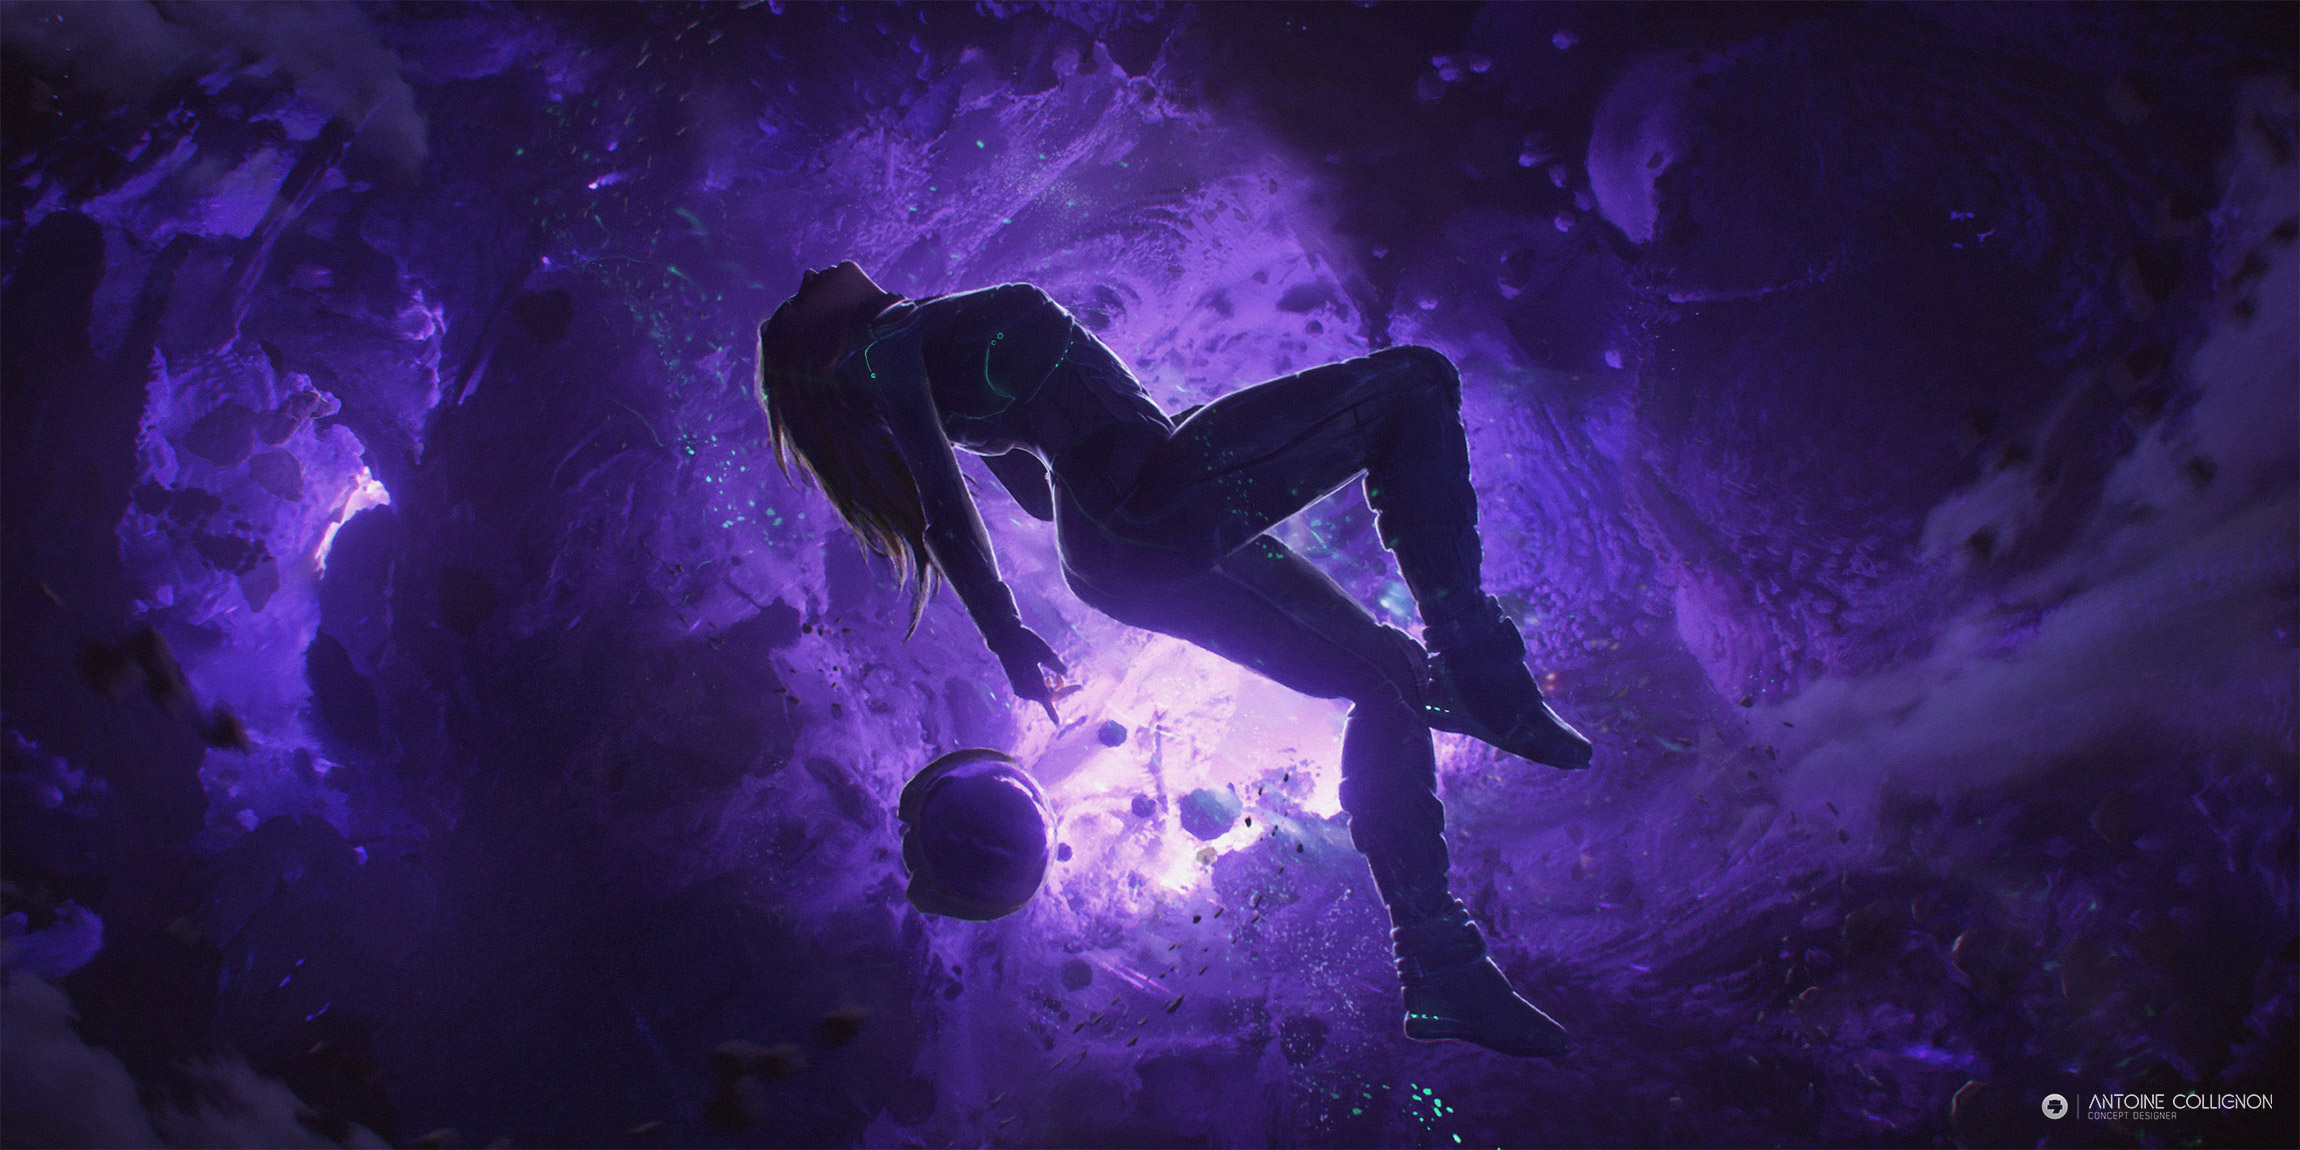 Wallpaper iPhone Stars on Purple Space